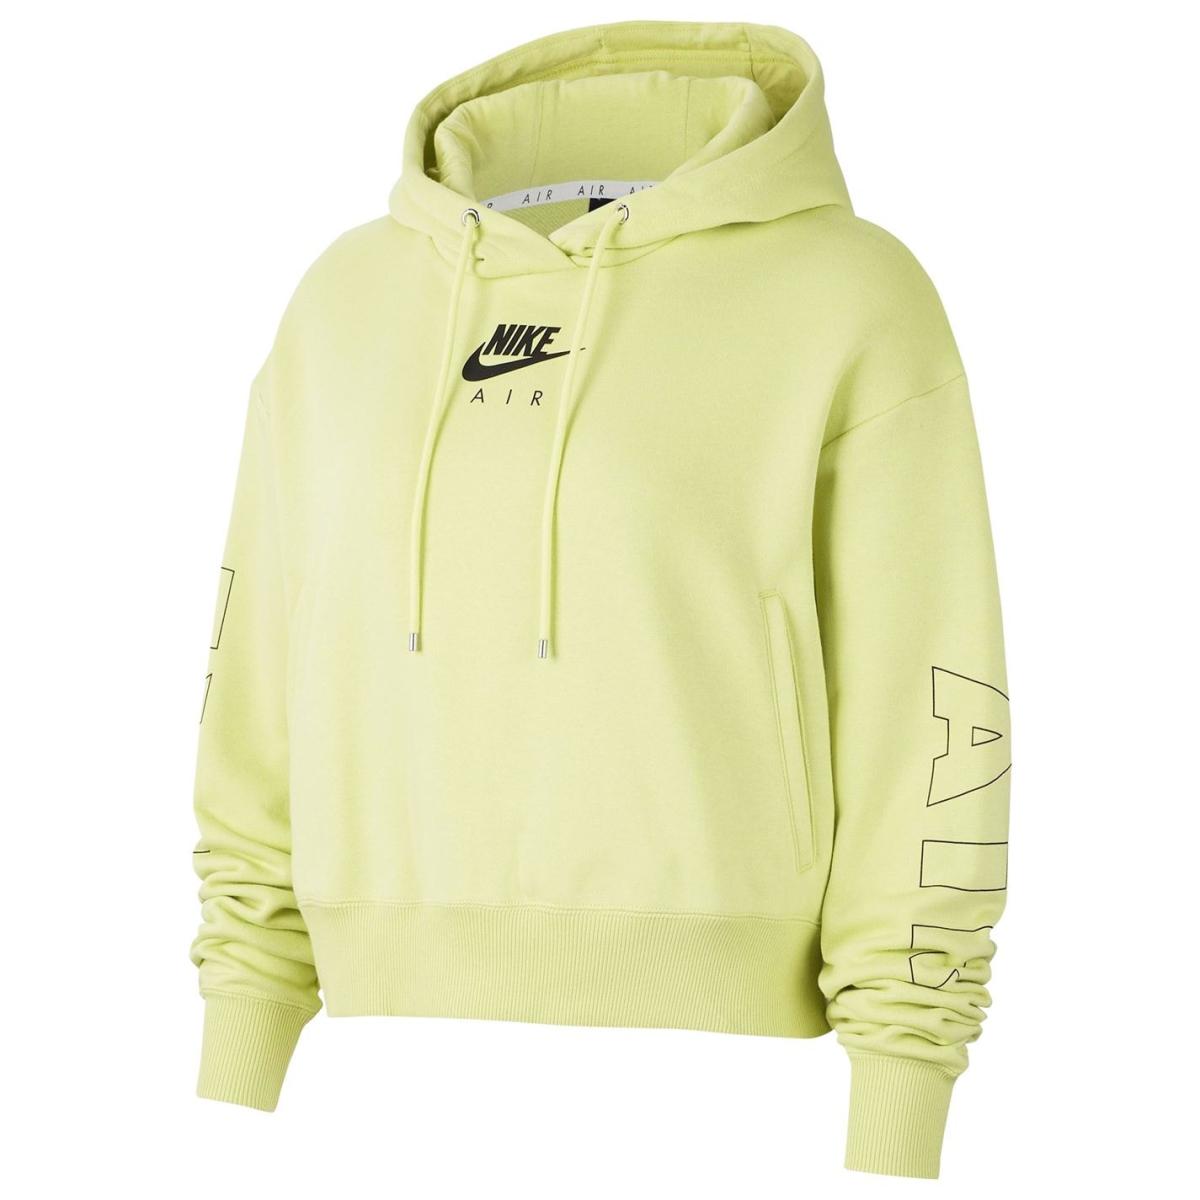 Nike Kapuzenjacke Jacke Kapuzenpullover Damen Sweatshirt Pullover Fleece 4085